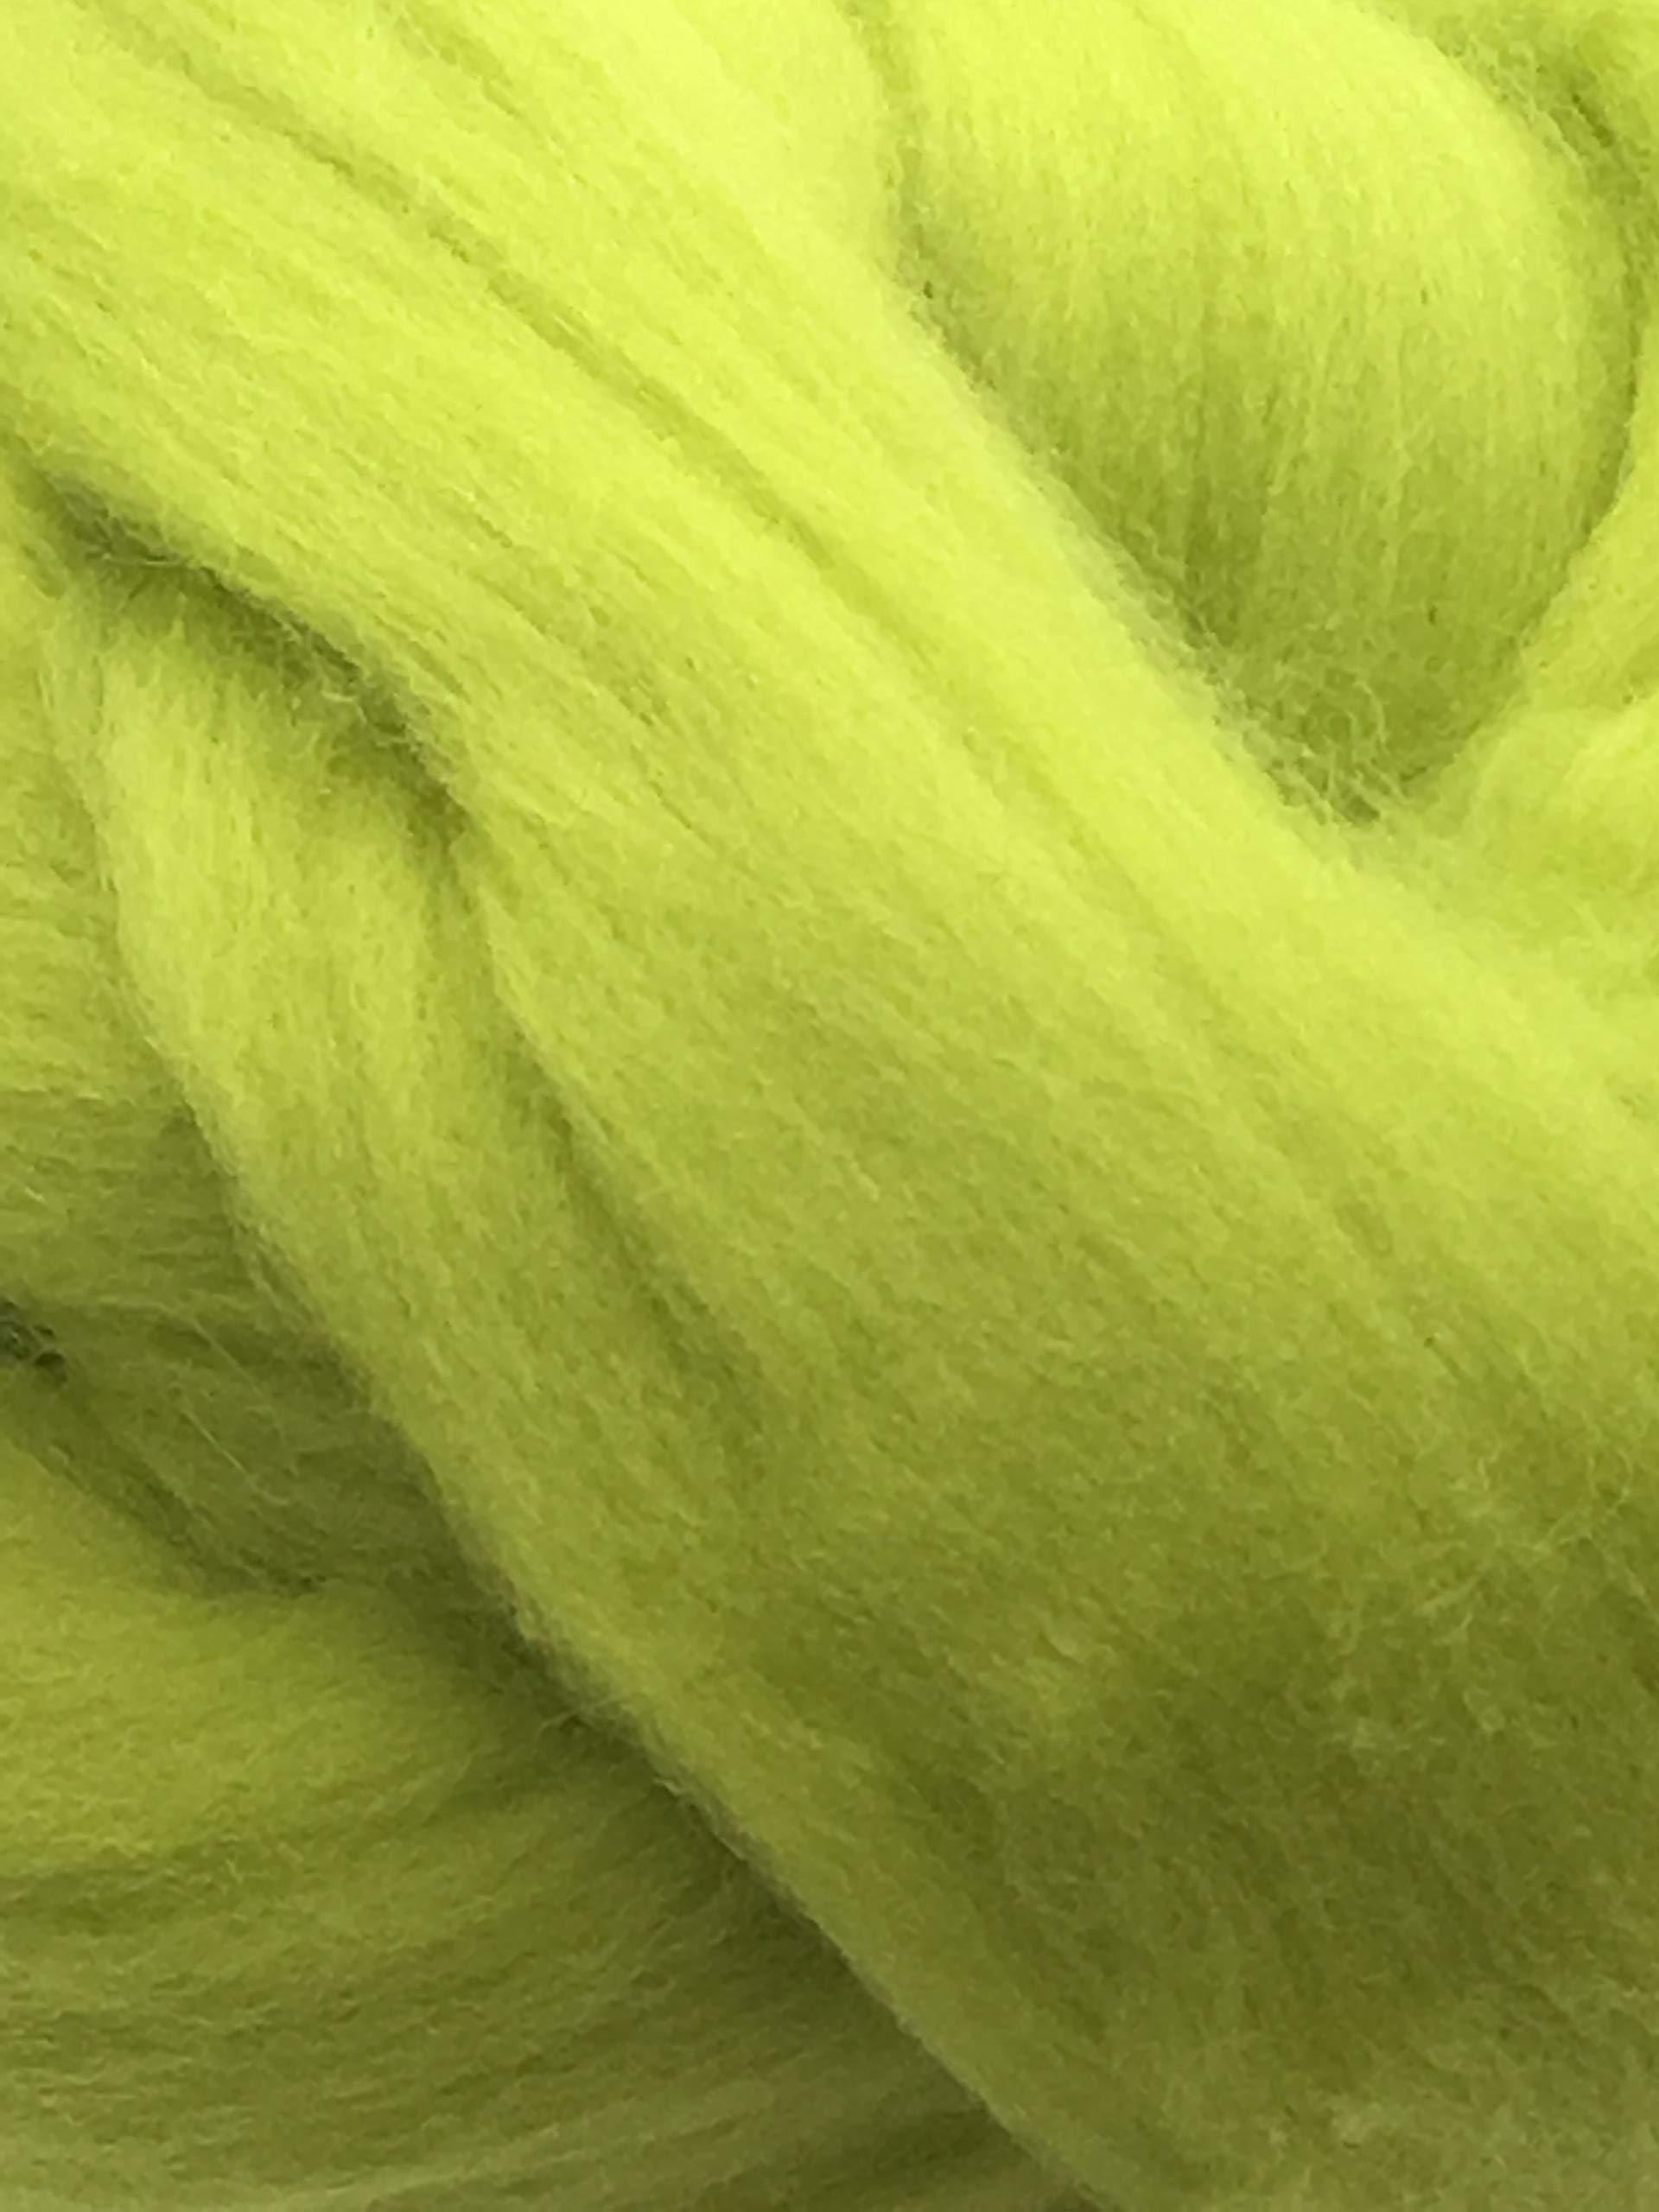 1lb Felting Crafts USA Spruce Green Wool Top Roving Fiber Spinning